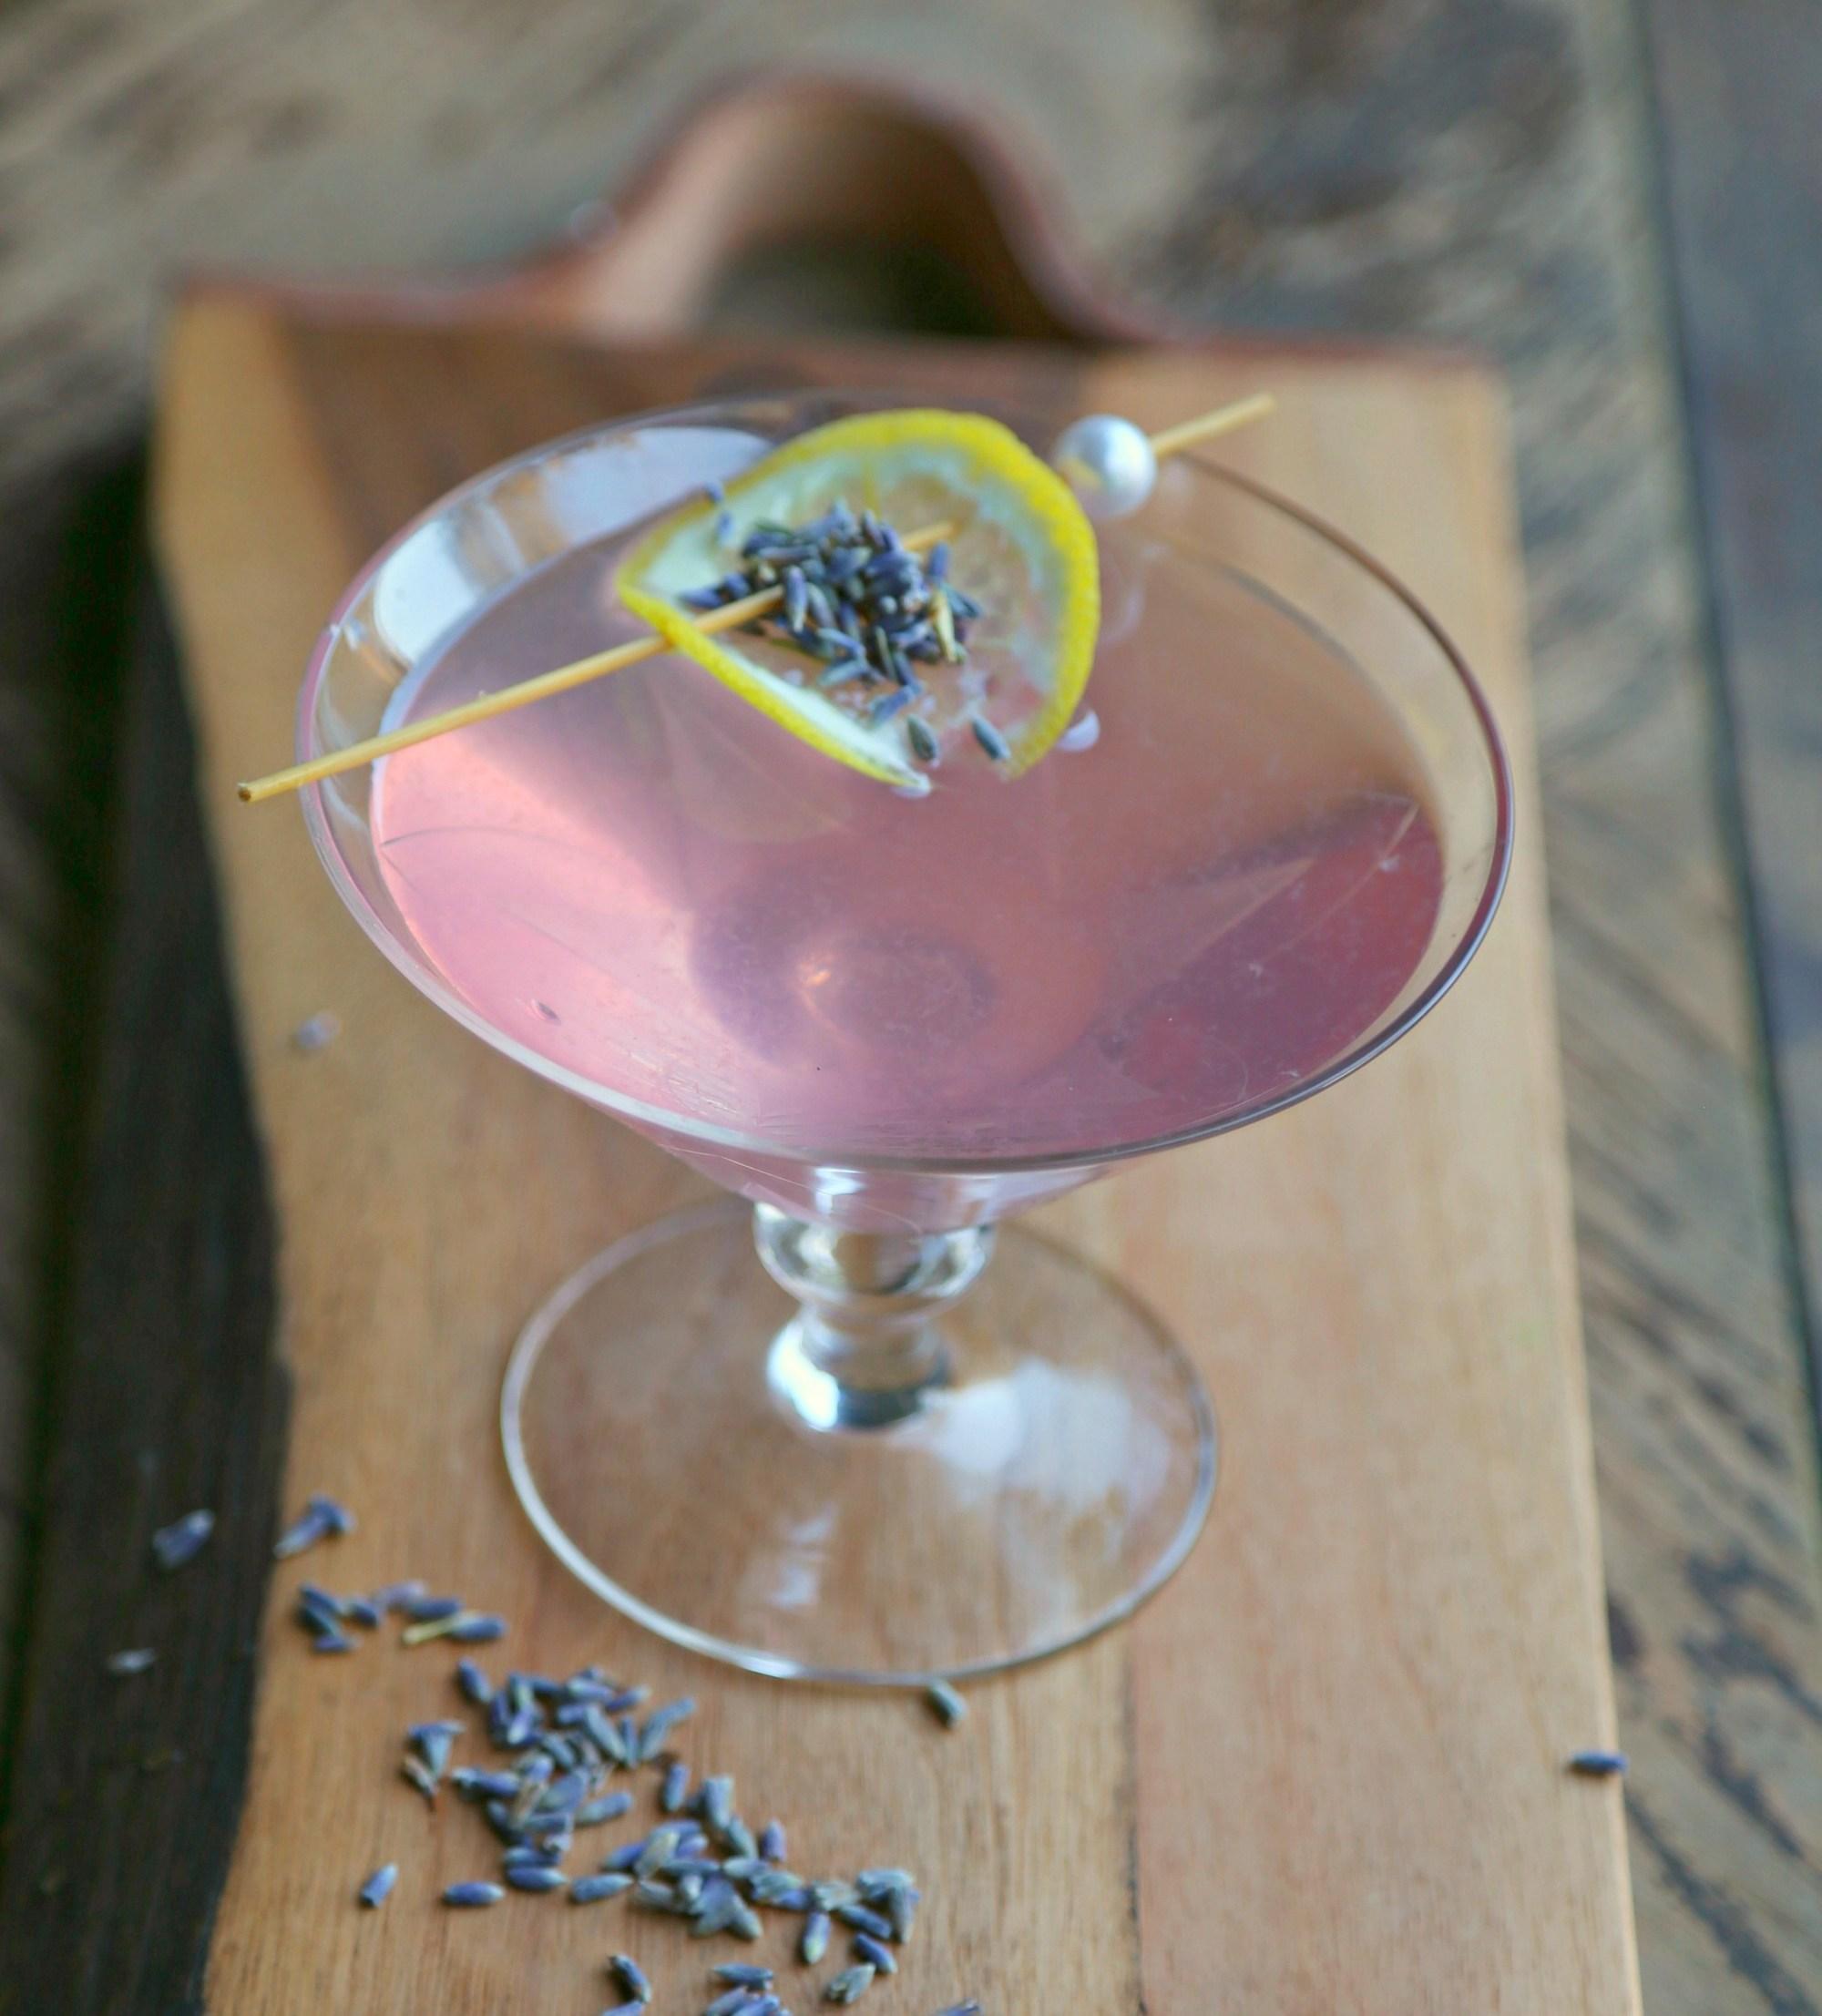 lavender-martini-lavender-syrup-vianneyrodriguez-sweetlifebake-1.jpg